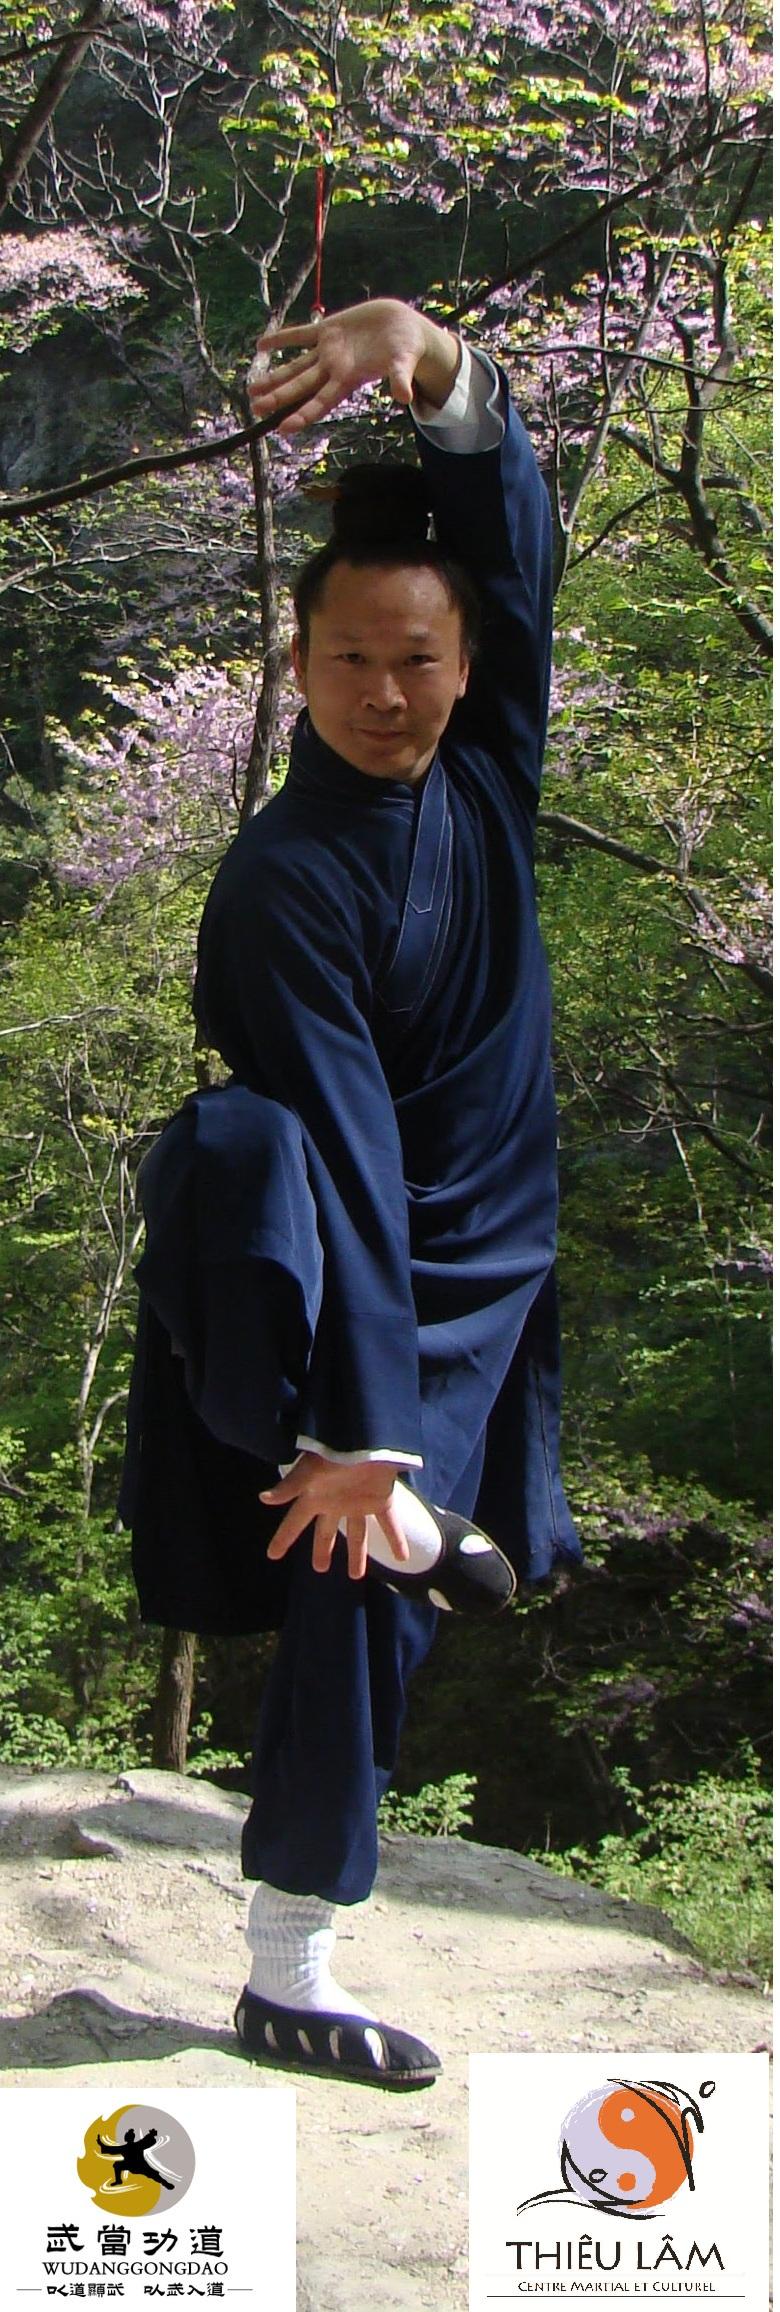 Maître Yuan Li Min.